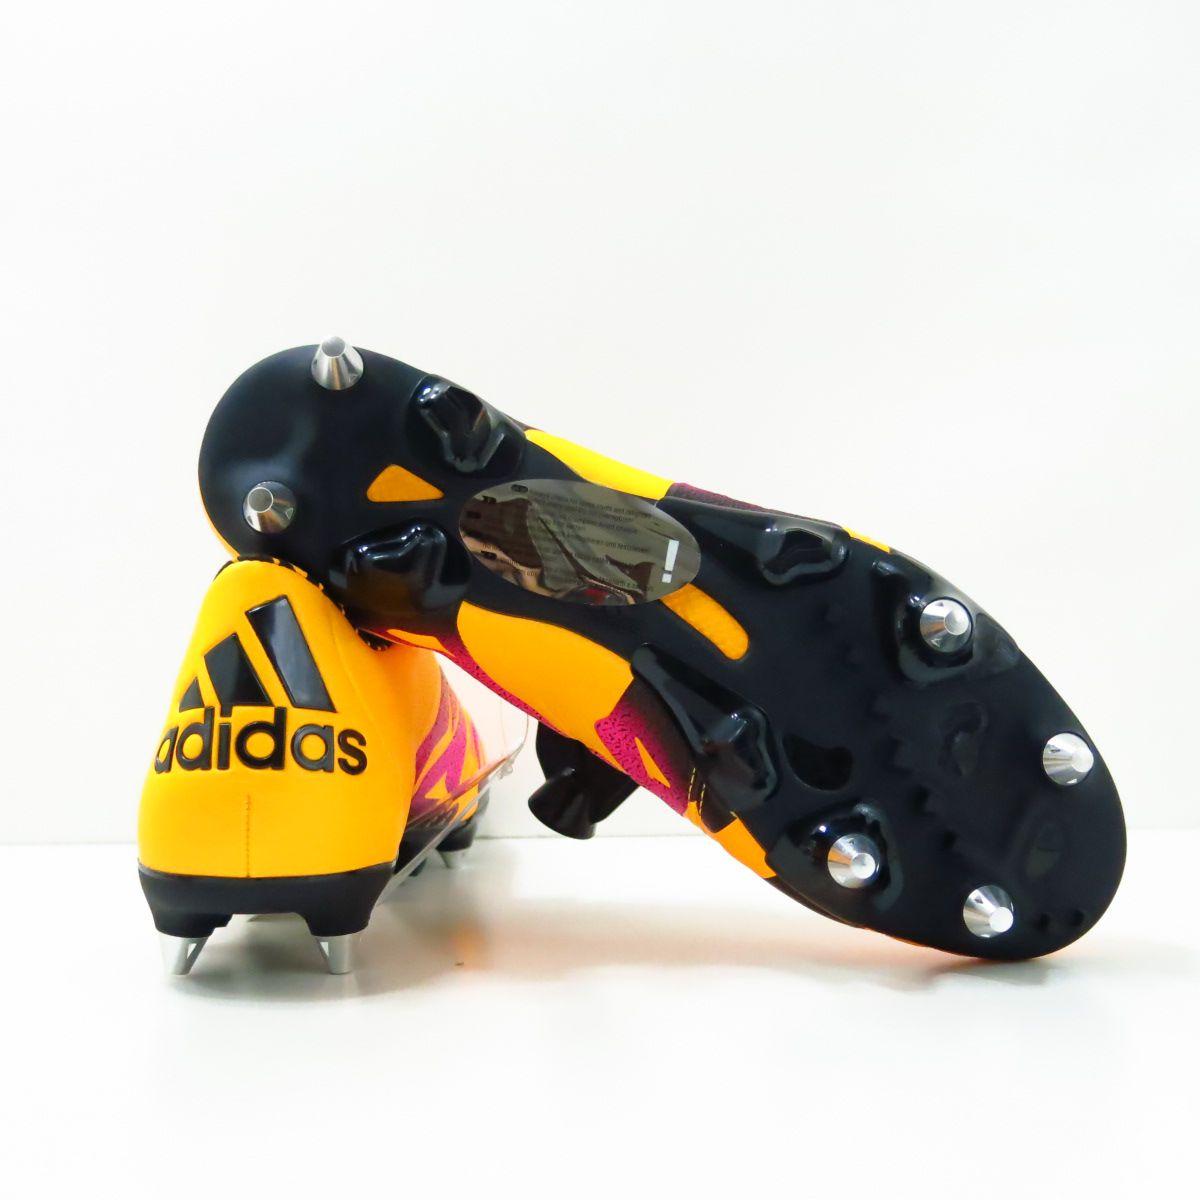 Chuteira adidas X 15.1 SG Couro - Trava Mista